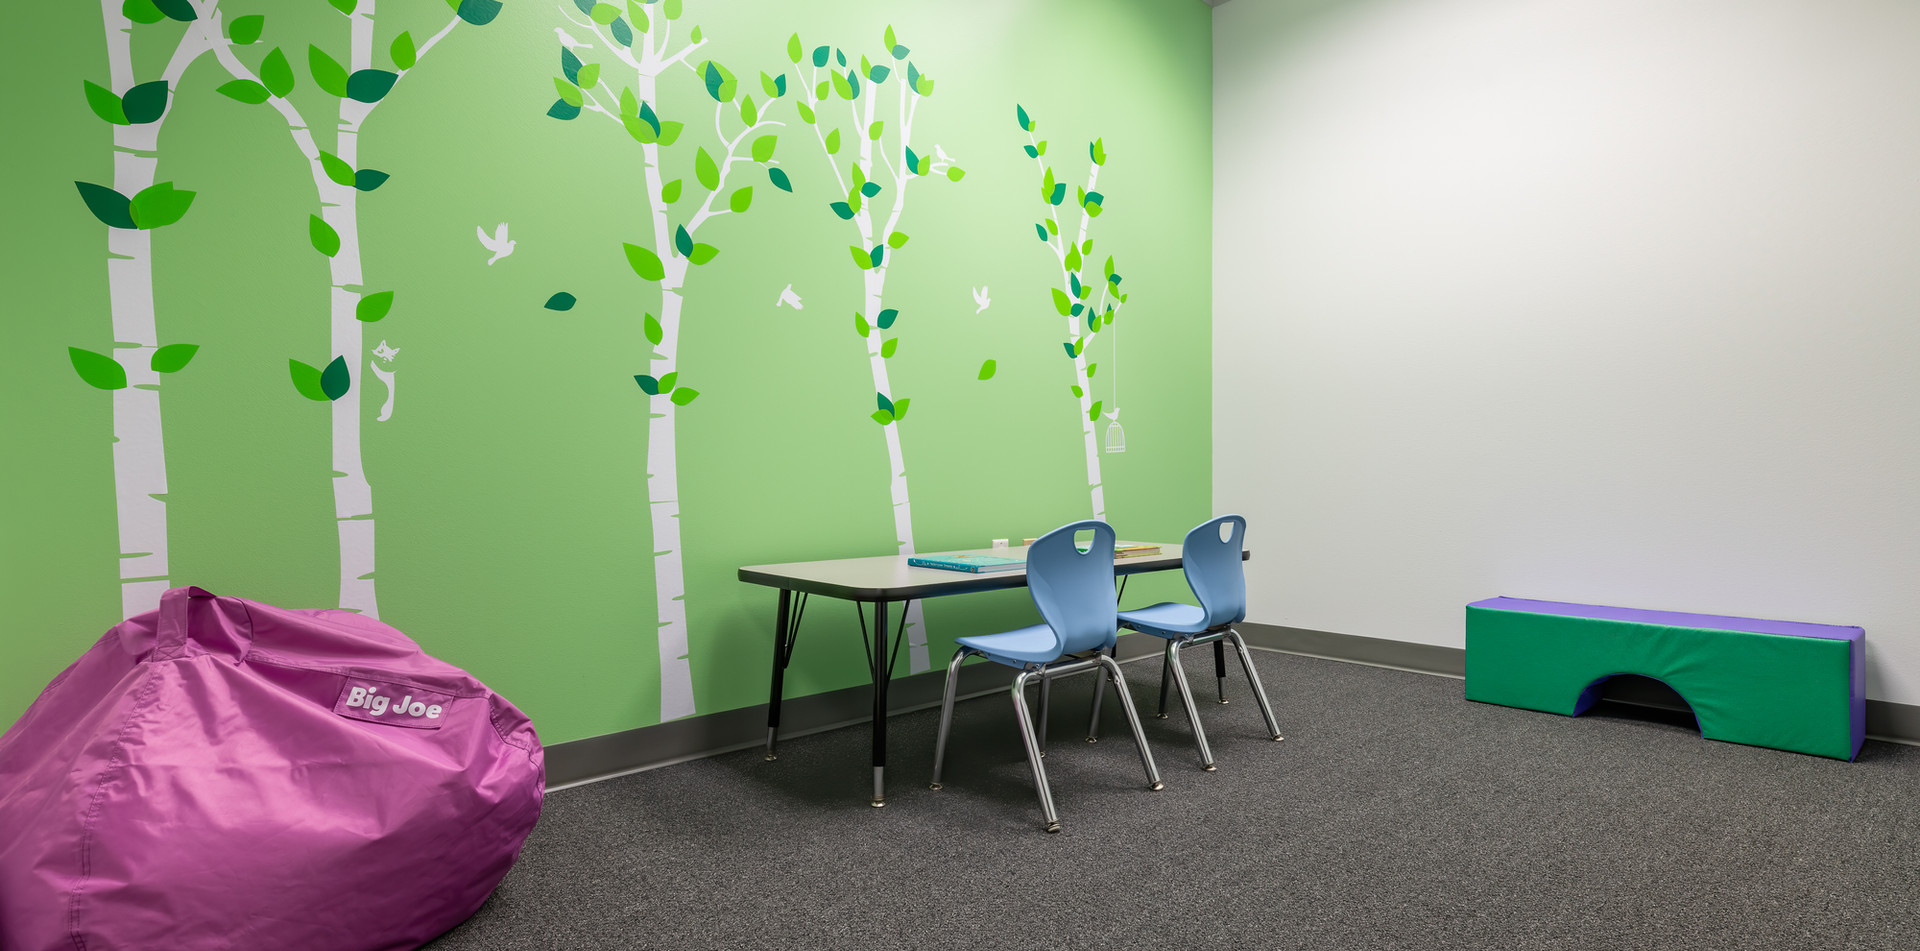 Houston Center Treatment Room 6